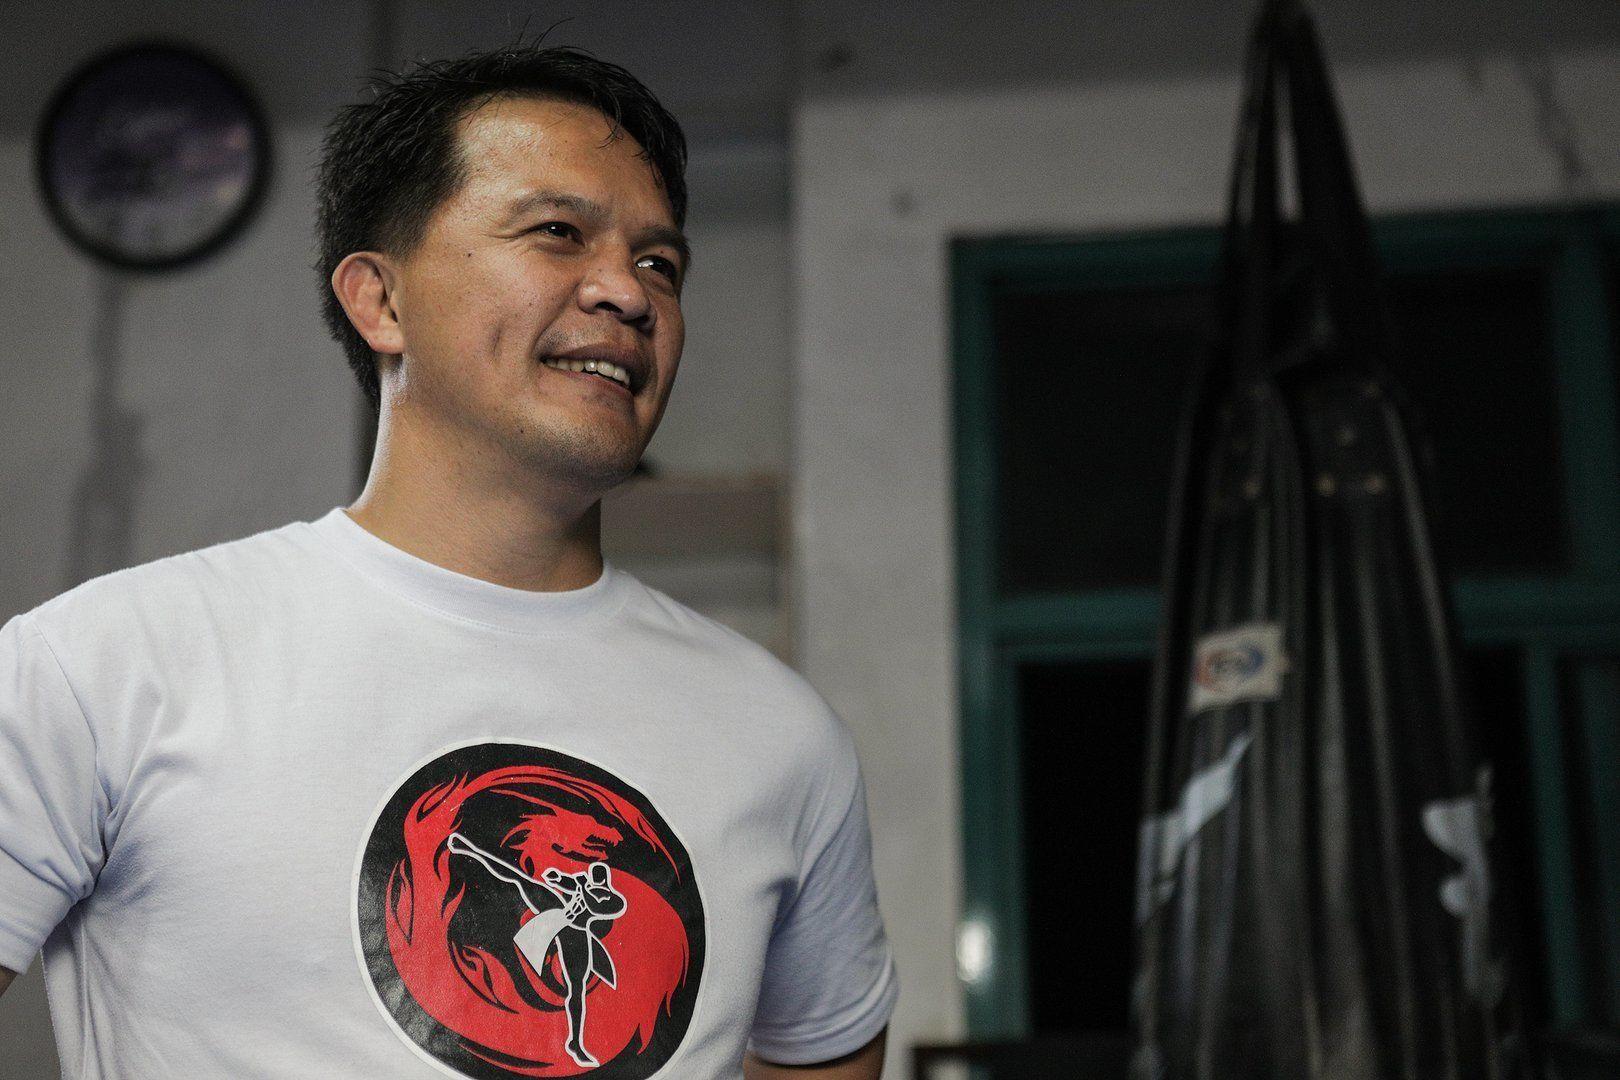 Tiebreaker Times Mark Sangiao hopes to replicate same Team Lakay magic with Kickboxing NT 2019 SEA Games Kickboxing News ONE Championship  Team Lakay Mark Sangiao 2019 SEA Games - Kickboxing 2019 SEA Games